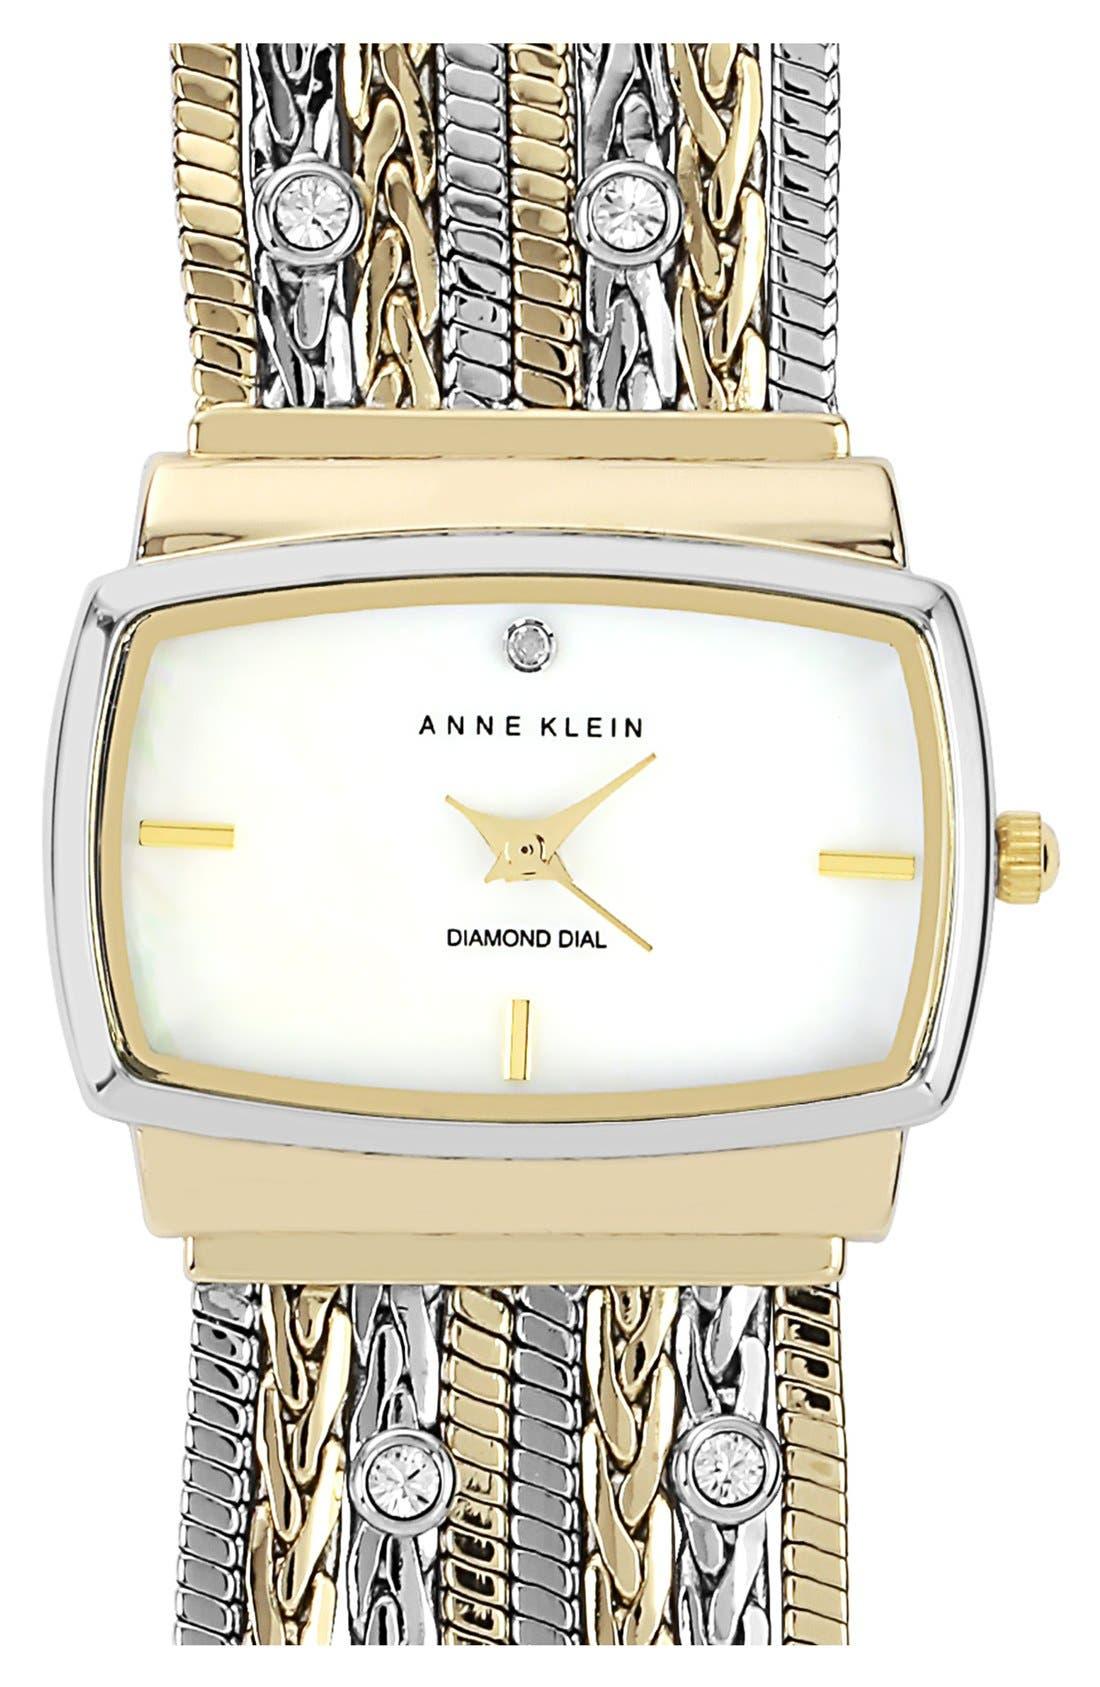 Alternate Image 1 Selected - Anne Klein Single Diamond Two Tone Bracelet Watch, 25mm x 19mm